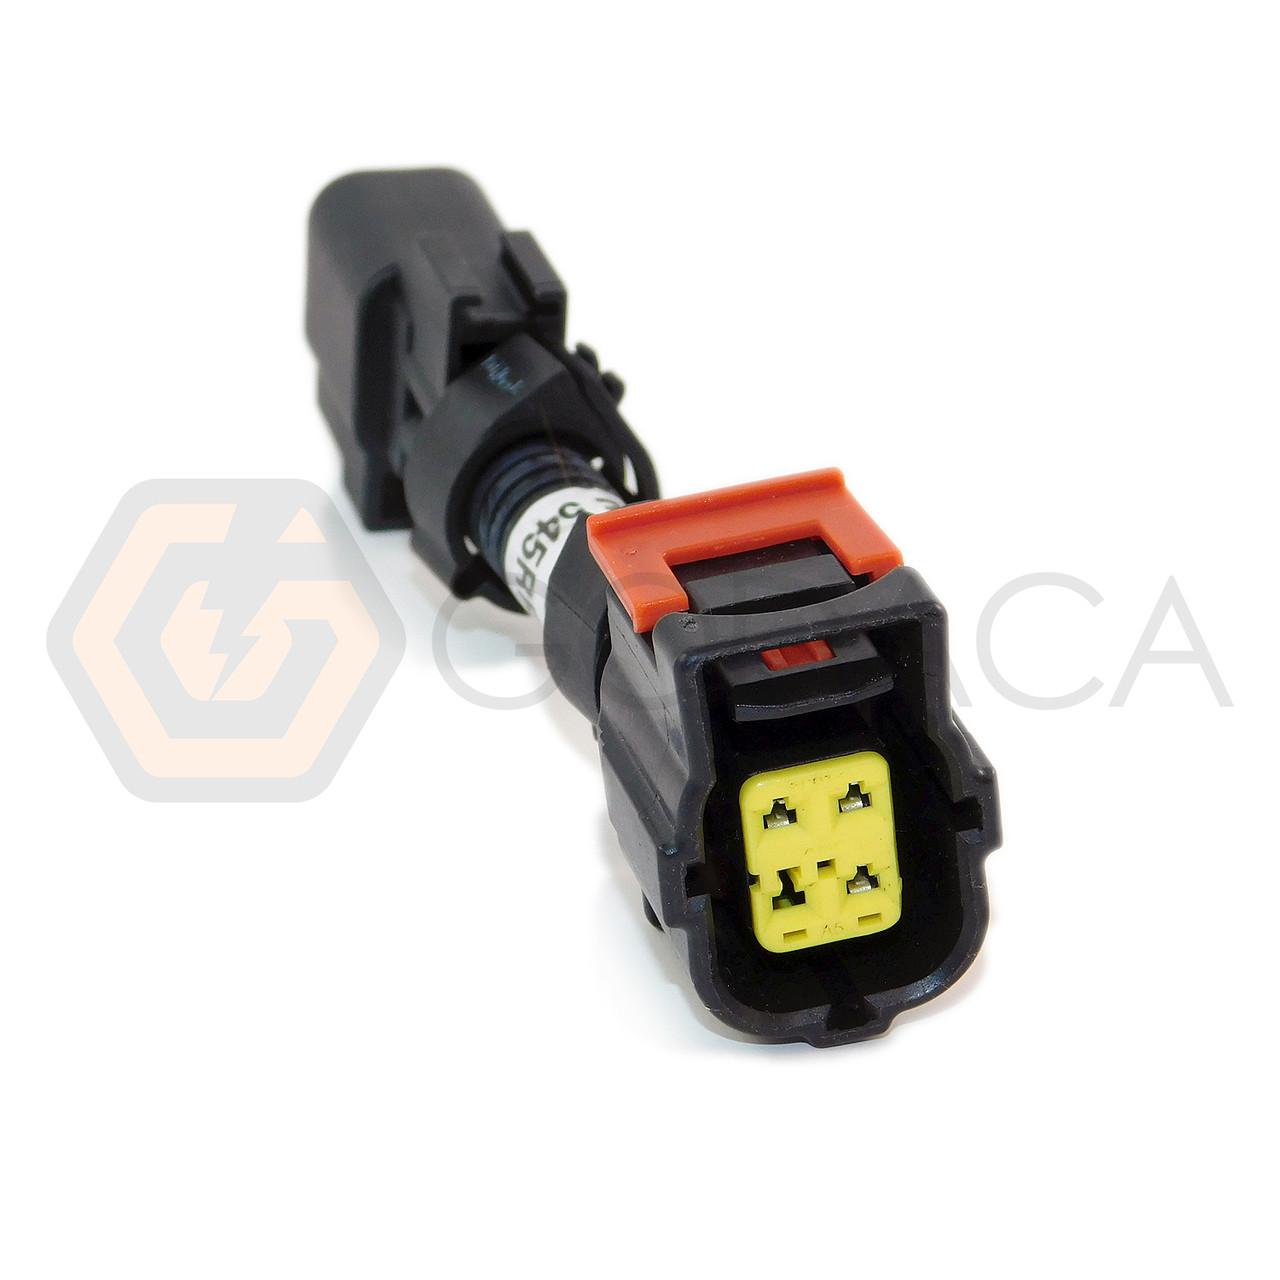 medium resolution of 1x wiring harness for dodge chrysler transmission line pressure booster 45rfe godaca llc